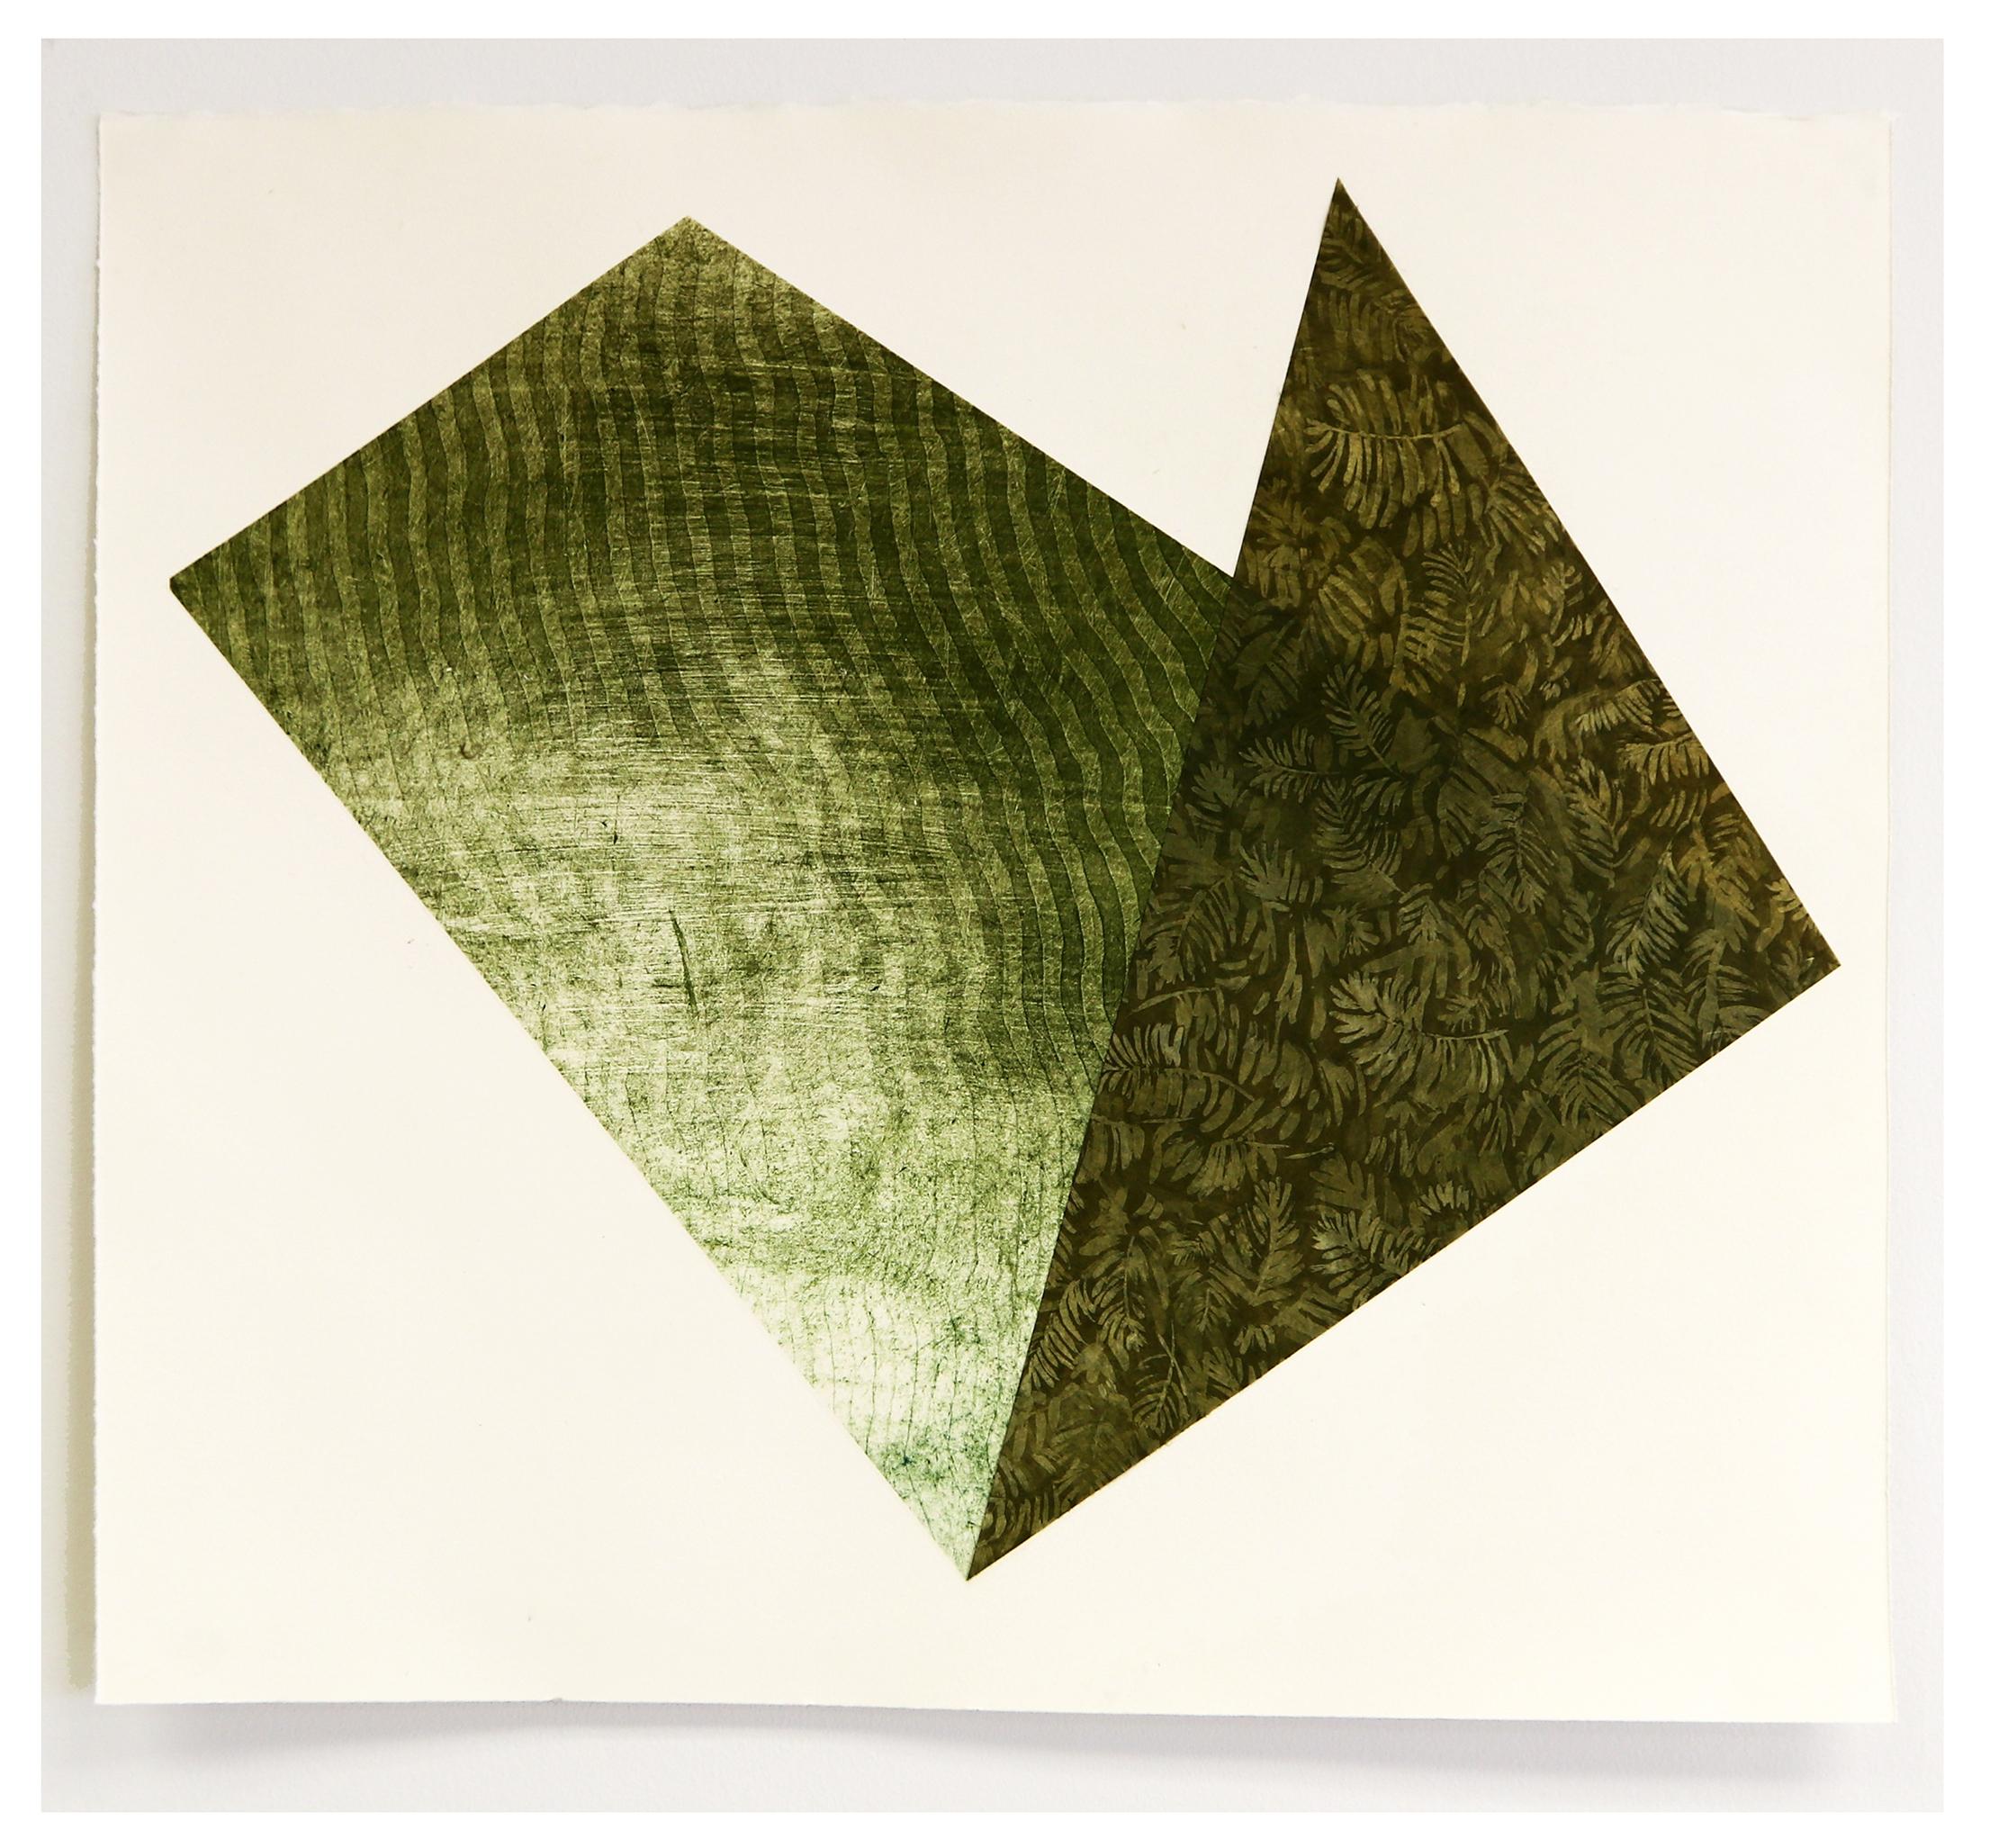 Hedge ; Intaglio and Chine Collé, 22''x25'', 2018